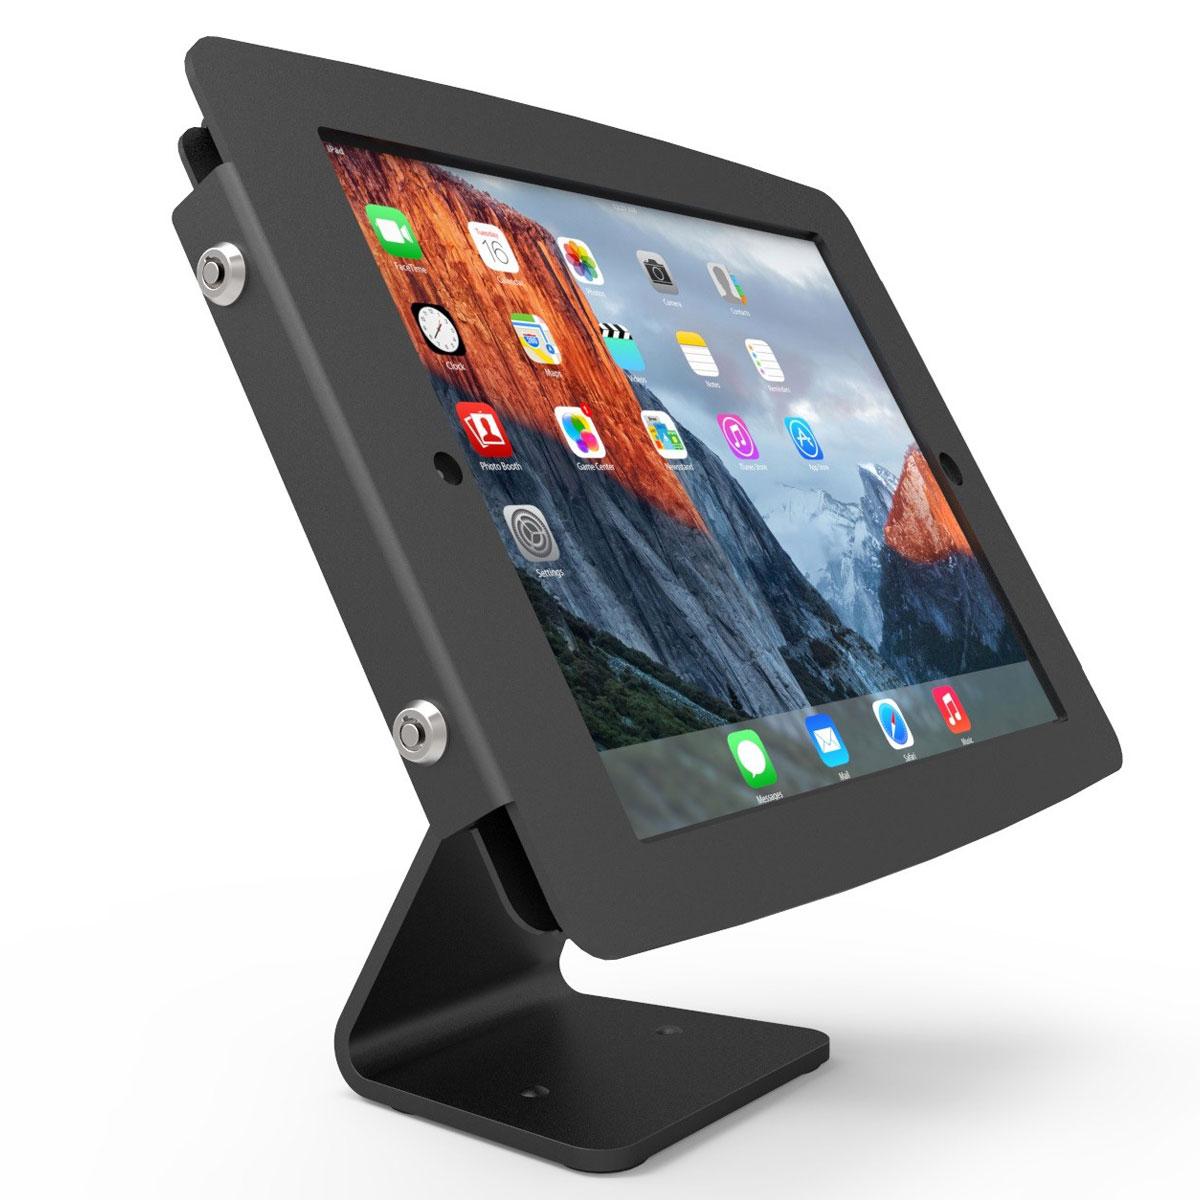 maclocks space ipad pro 360 noir accessoires tablette maclocks sur ldlc. Black Bedroom Furniture Sets. Home Design Ideas